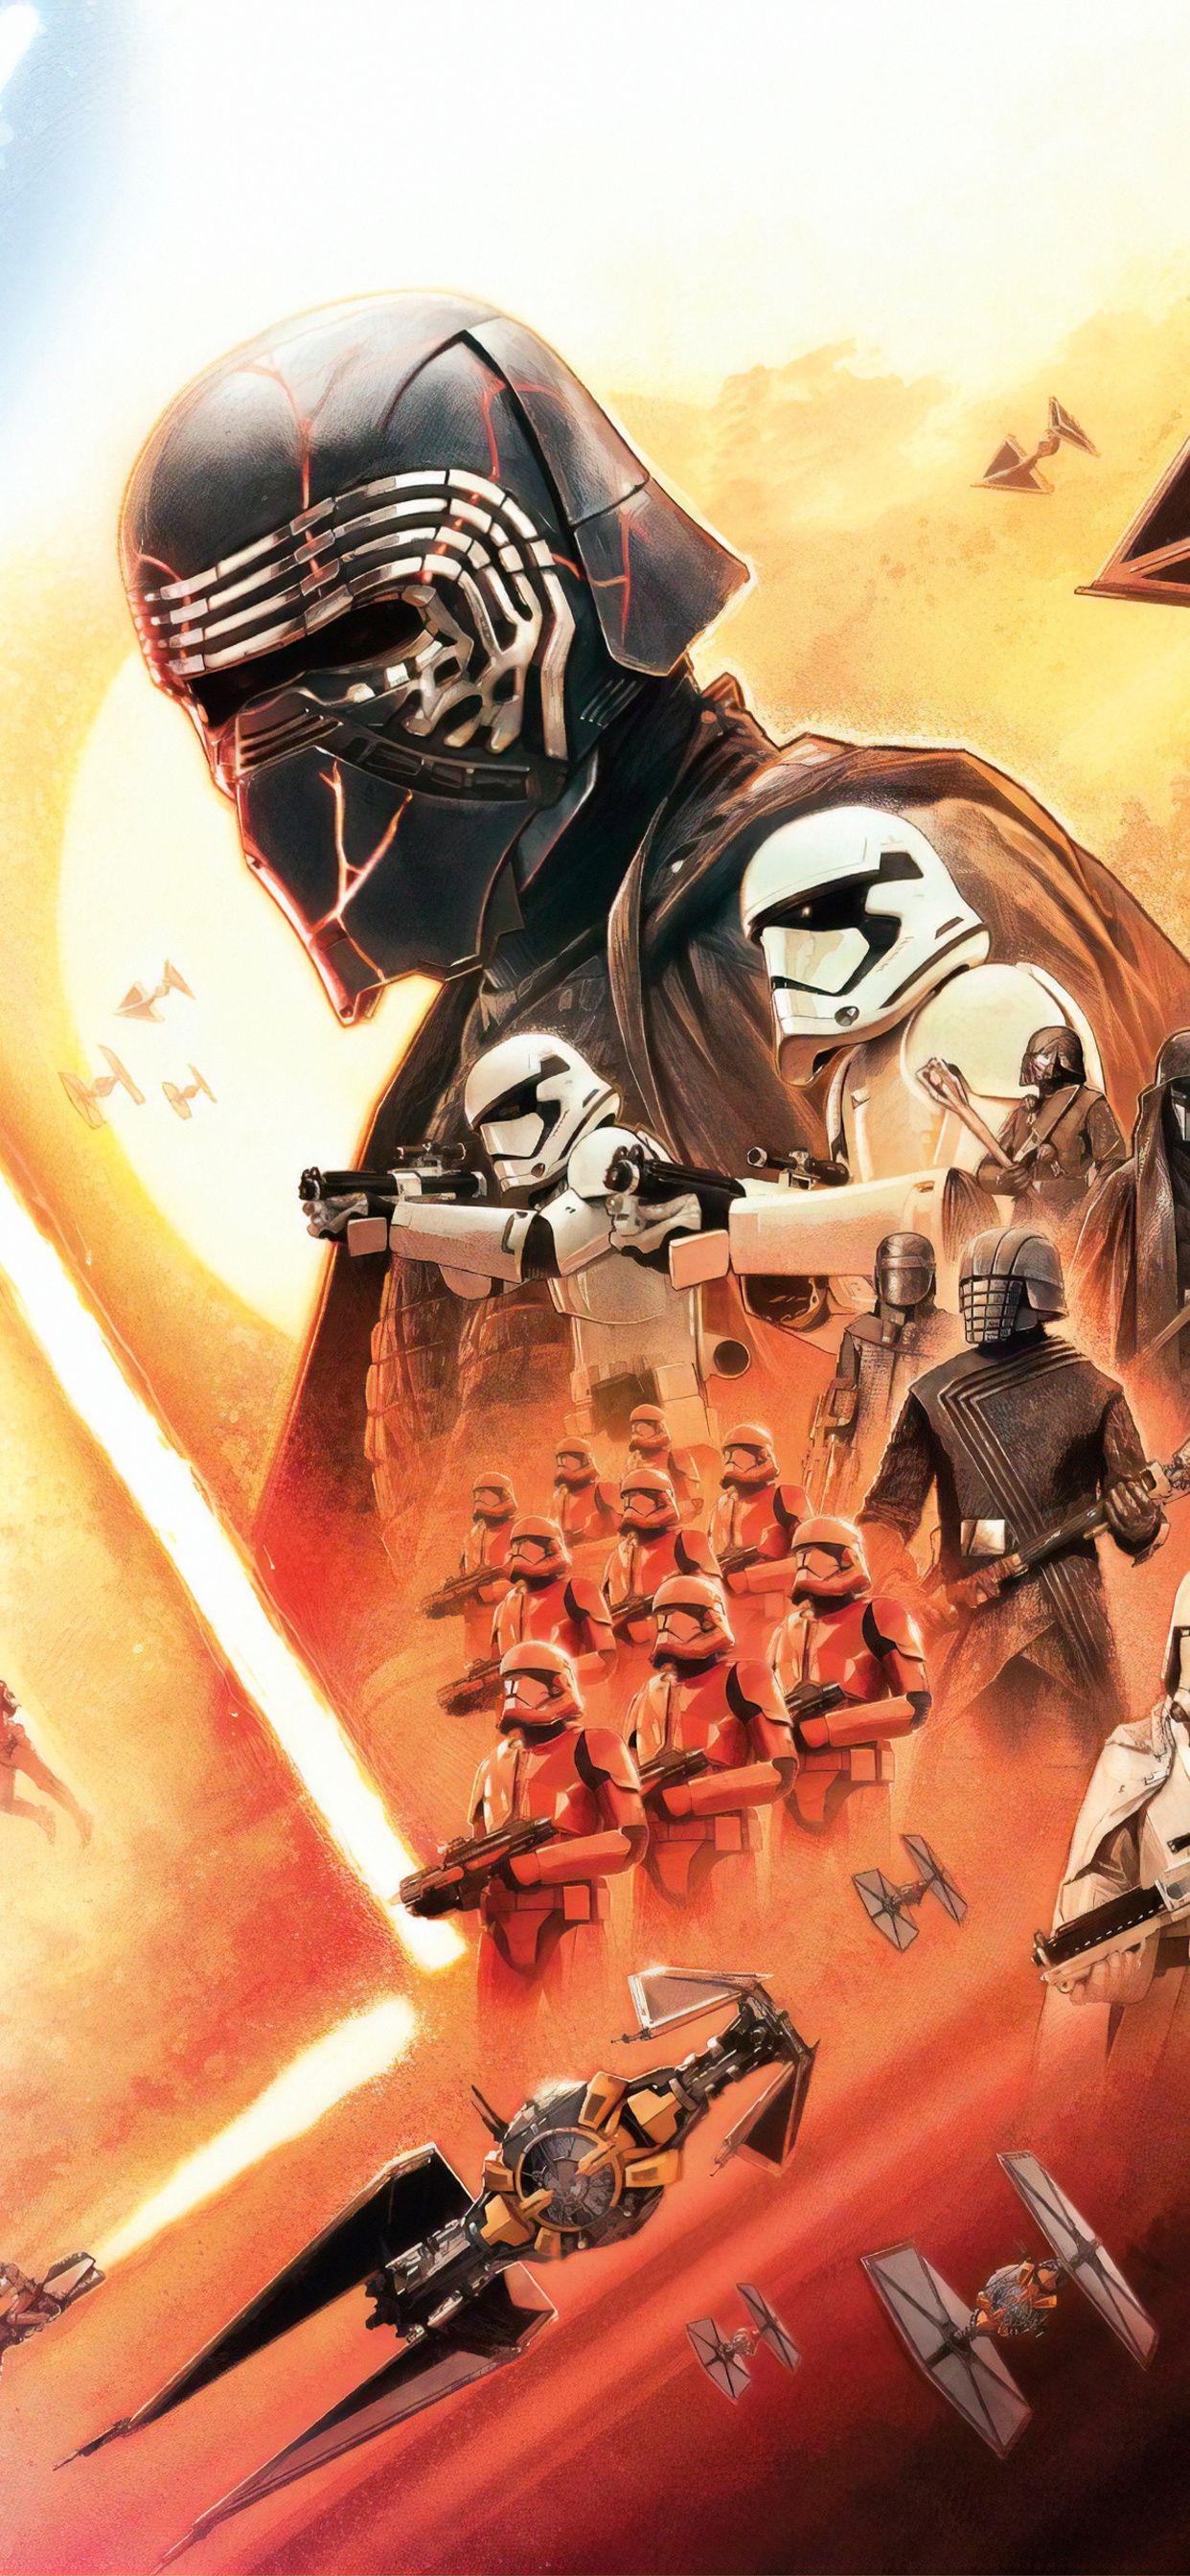 Star Wars The Rise Of Skywalker Star Wars Wallpaper Star Wars Watch Star Wars Painting